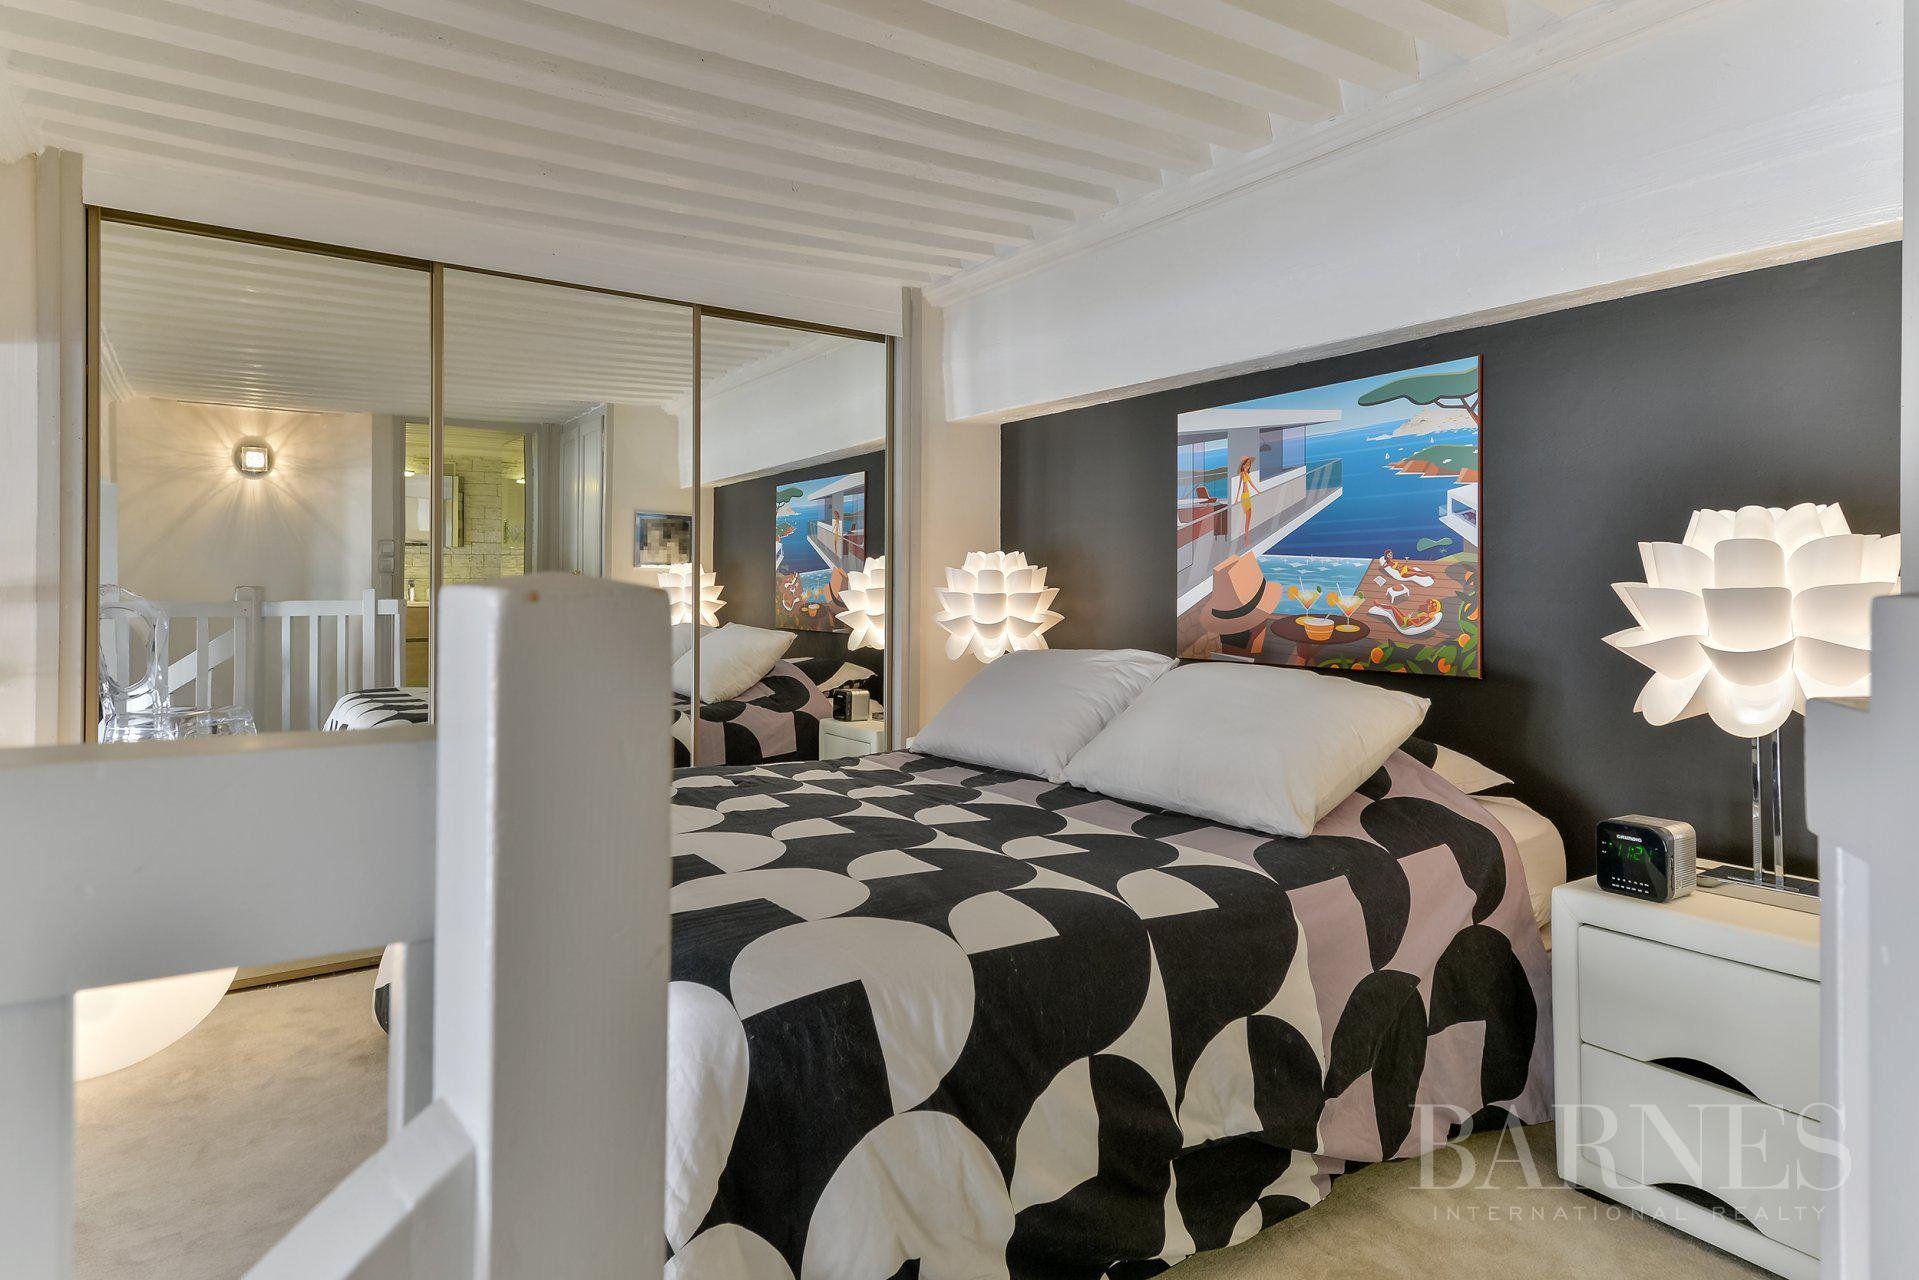 Lyon 5 - Vieux-Lyon - Apartment of 86 sqm - 2 bedrooms